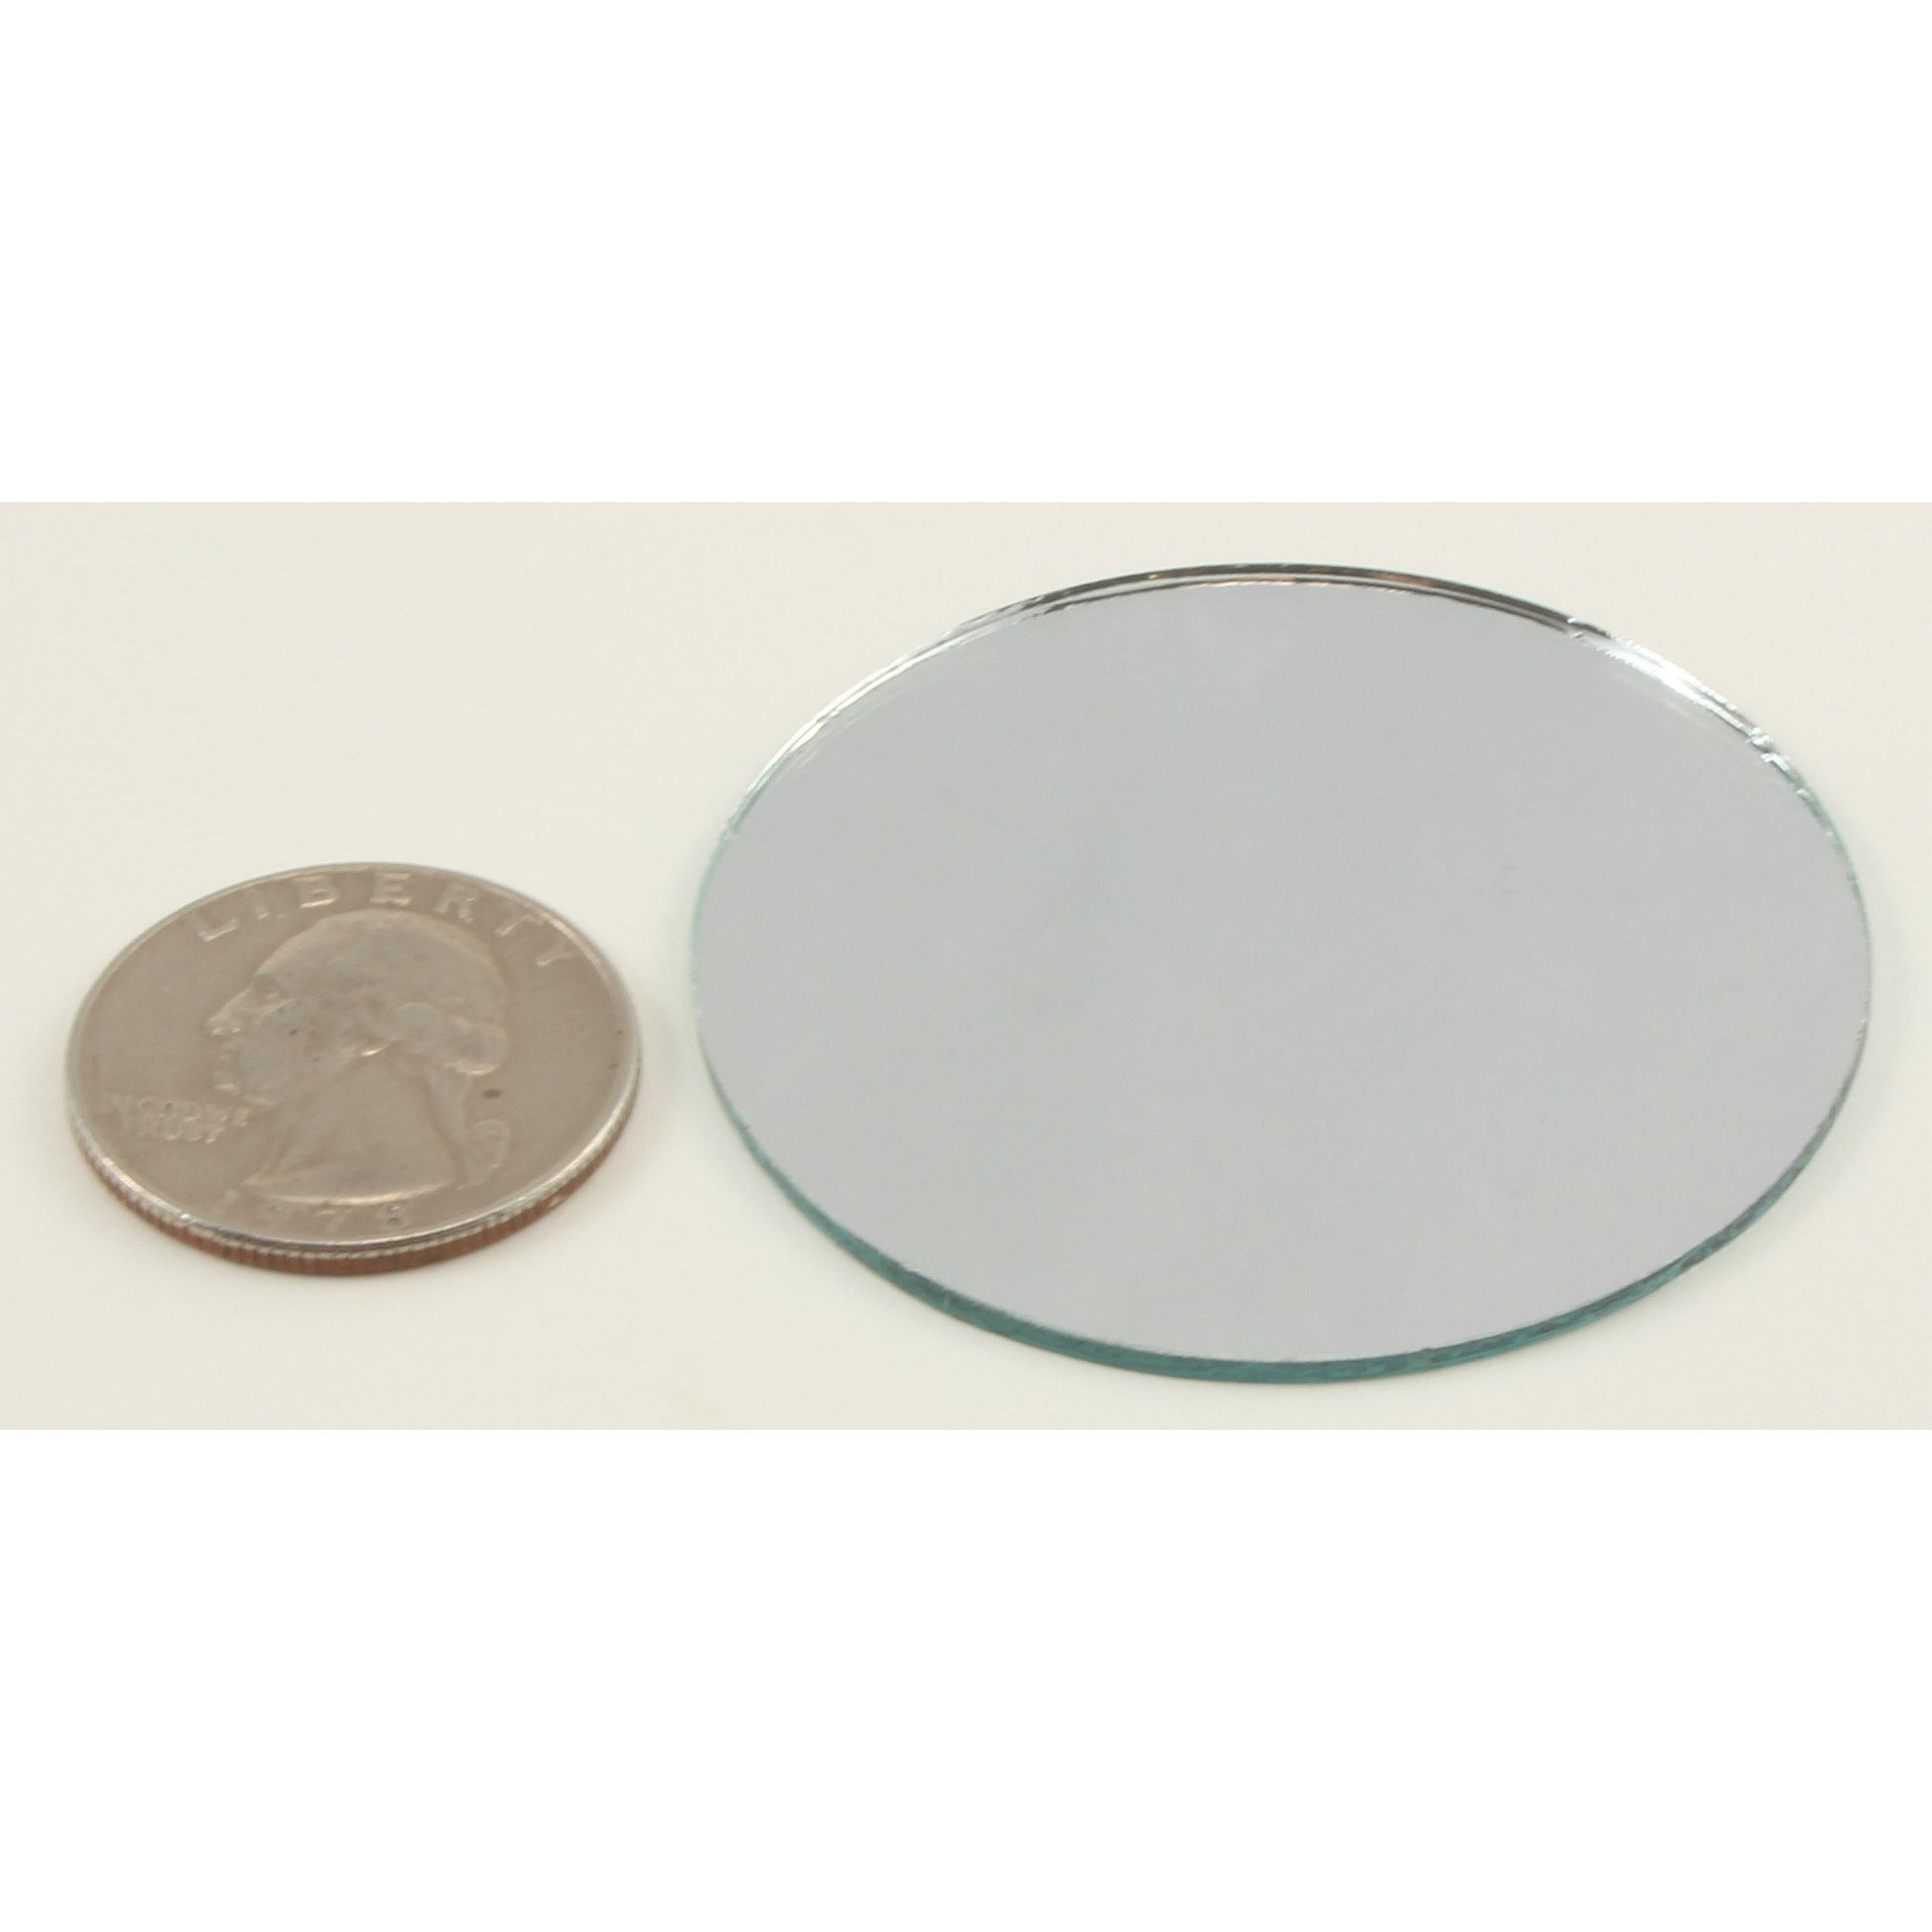 2 Inch Round Mirrors Bulk Craft